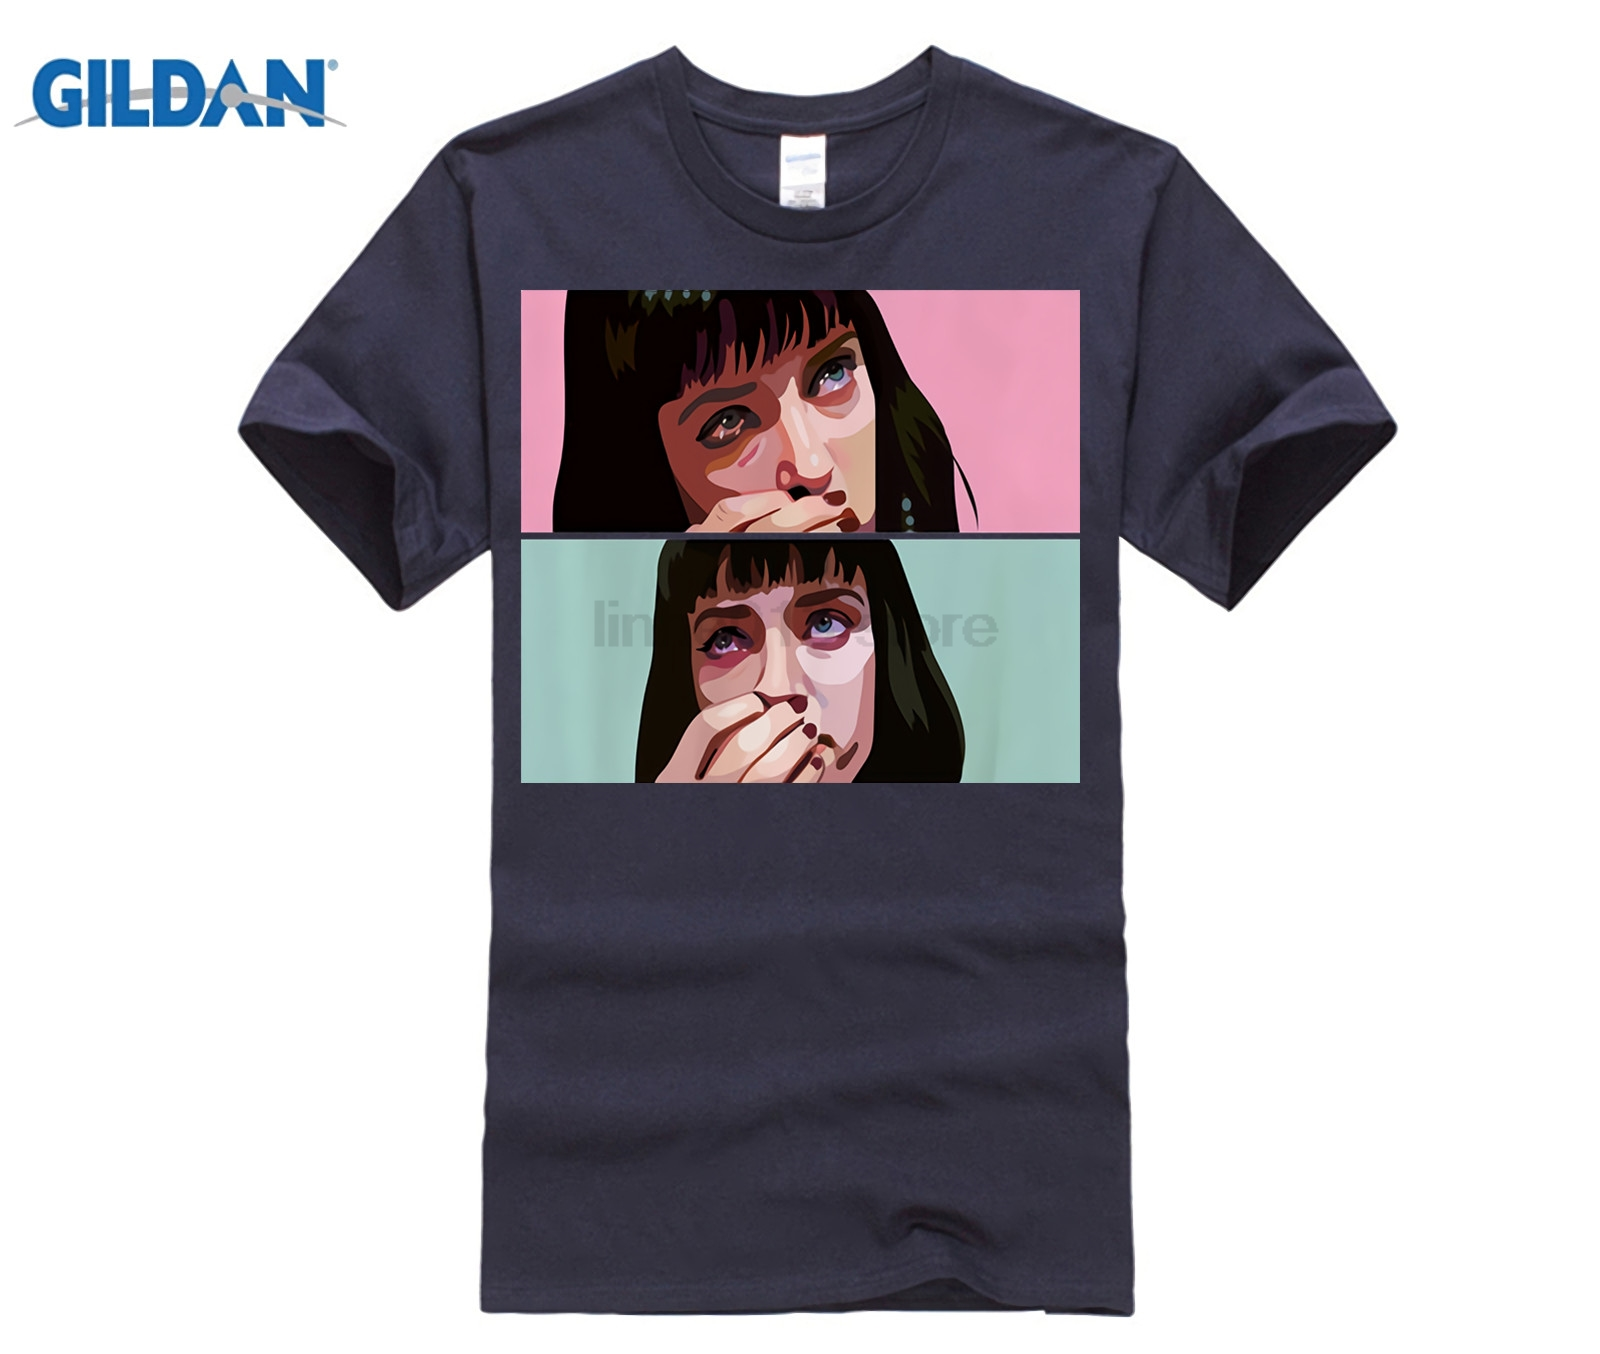 gildan-movie-pulp-fiction-t-shirt-men-uma-thurman-mia-wallace-quentin-font-b-tarantino-b-font-tees-short-sleeve-top-clothing-3xl